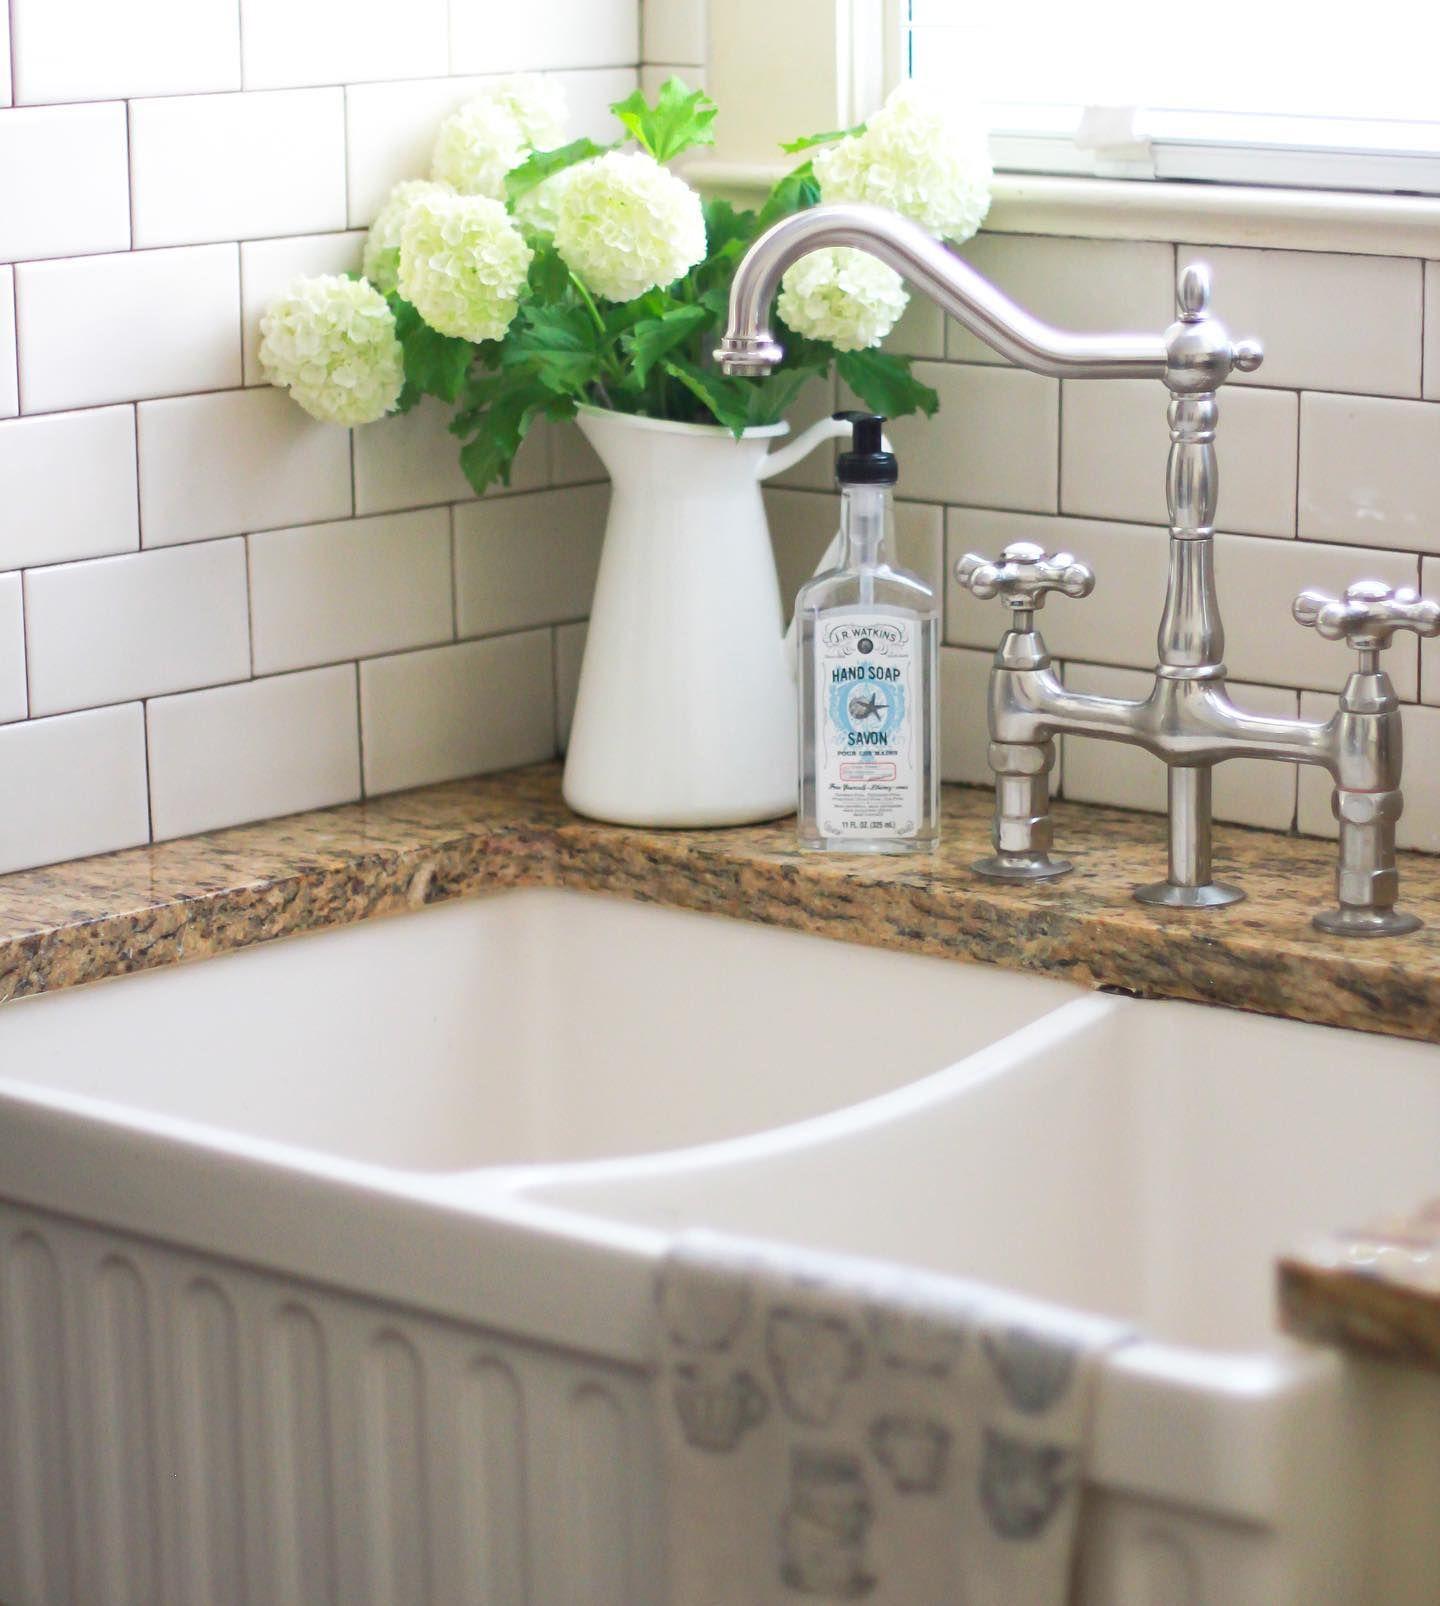 Bridge Style Kitchen Faucet With Metal Cross Handles In 2020